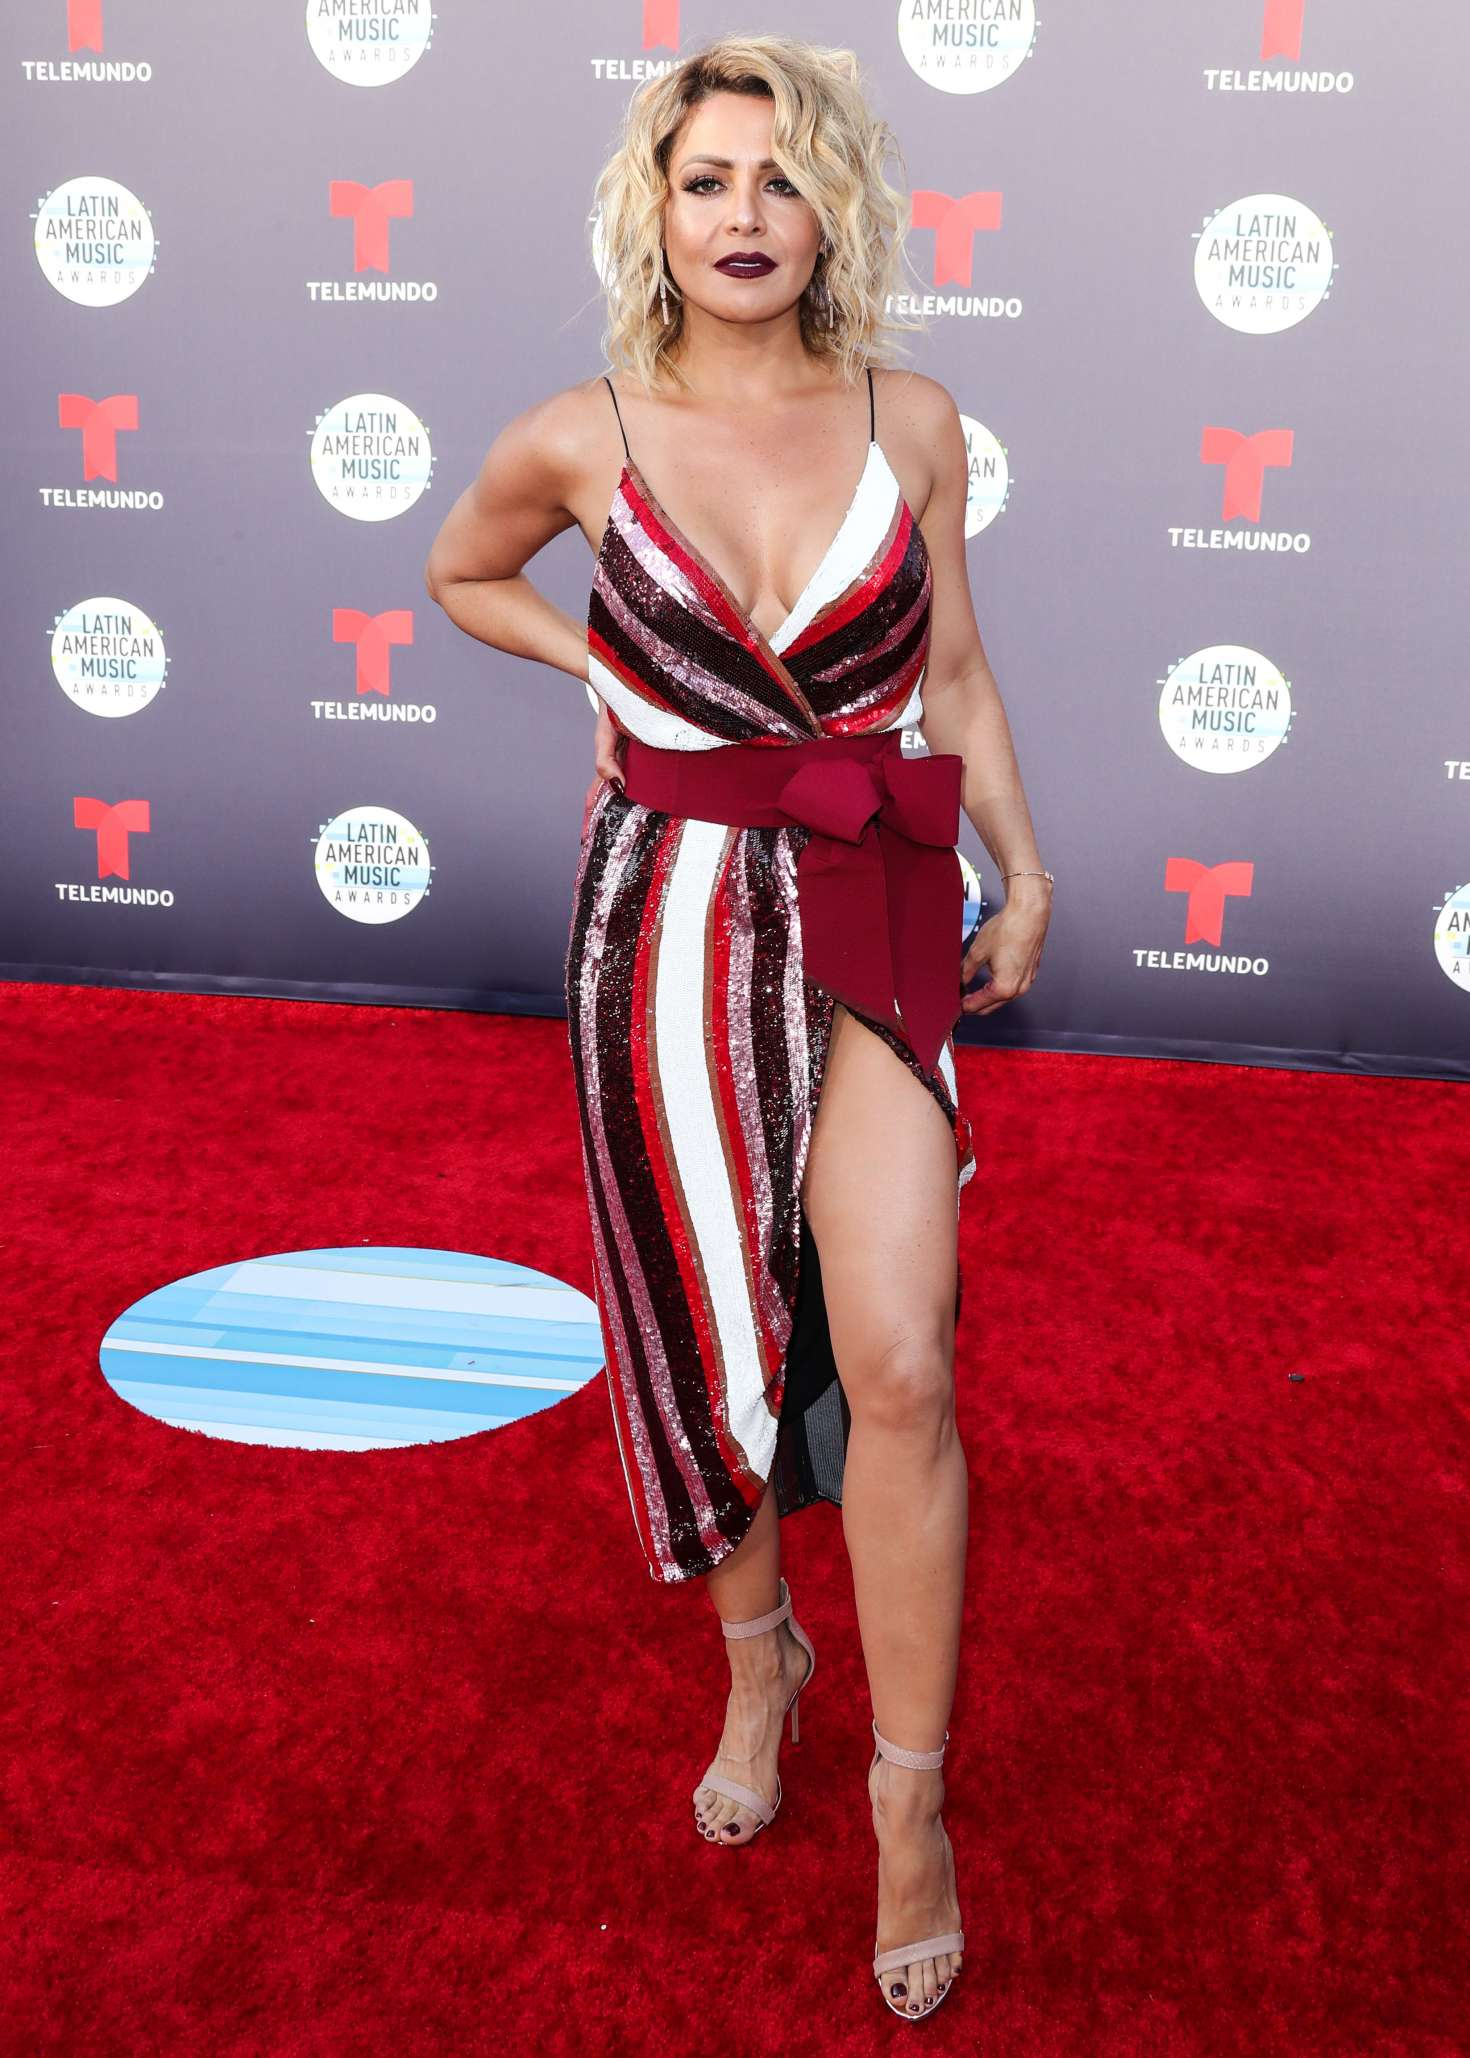 Dayana Garroz Instagram dayana garroz: 2018 latin american music awards -09 | gotceleb